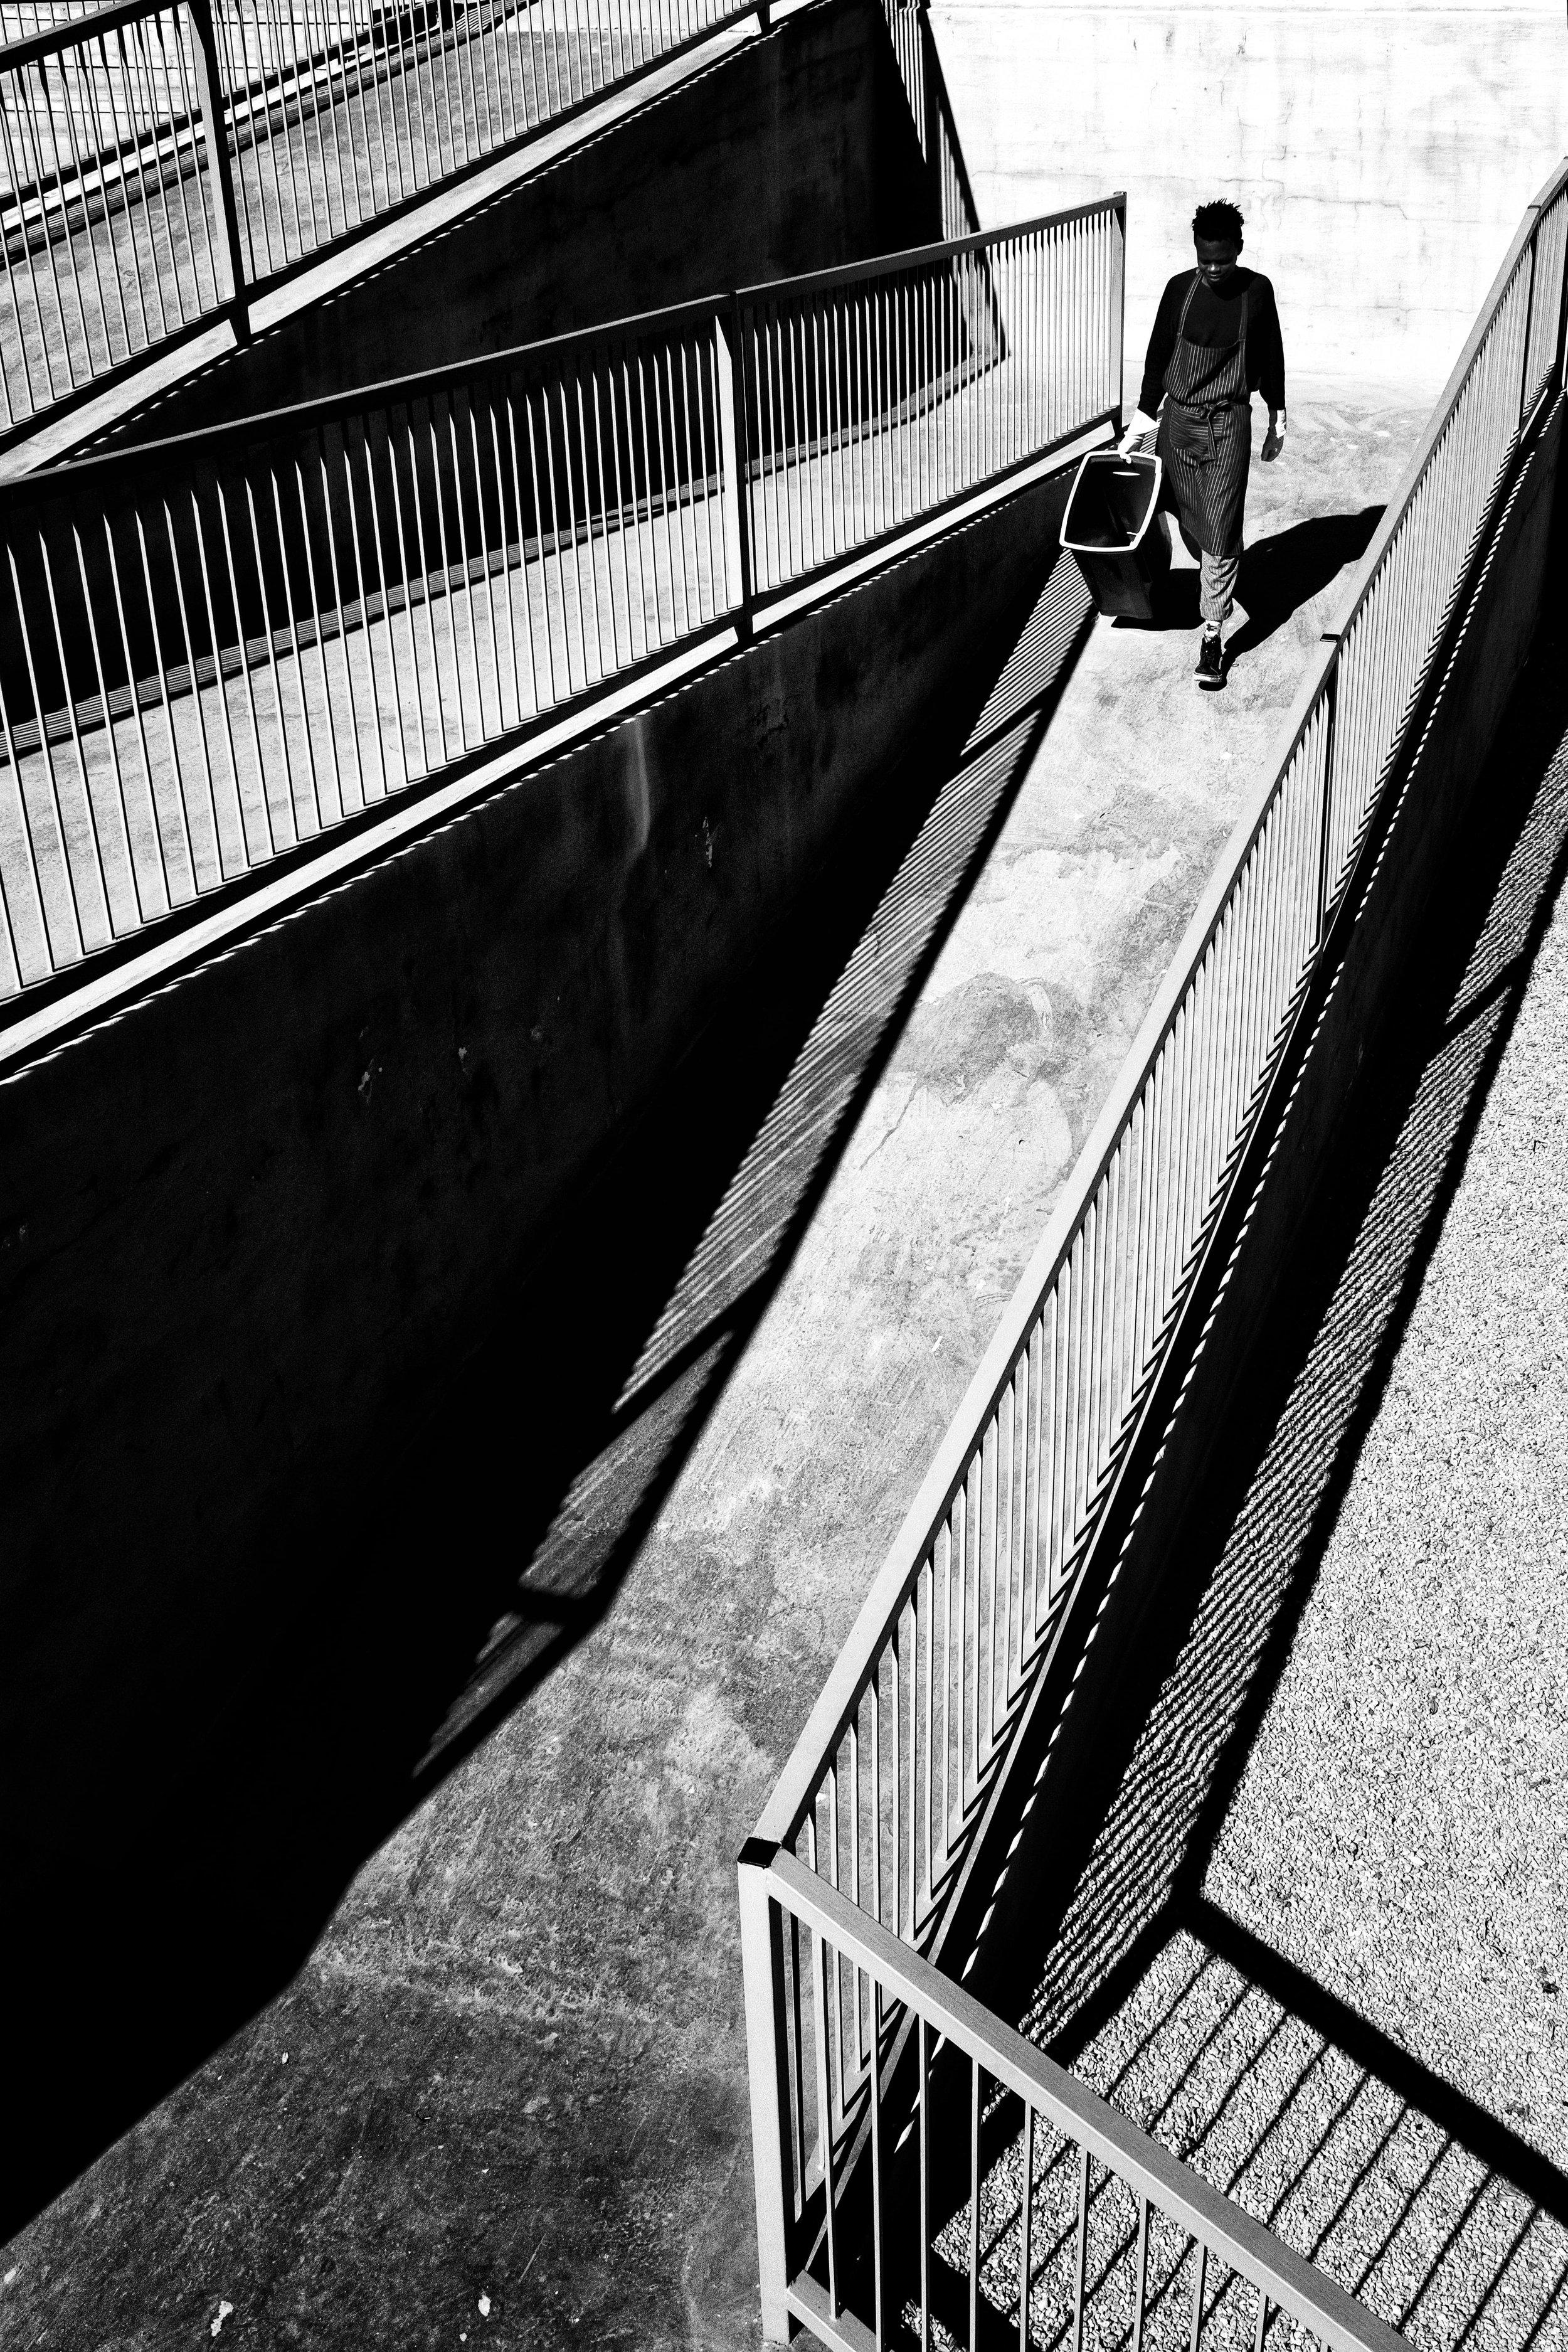 Img02 Lee-David de Haas-min.jpg